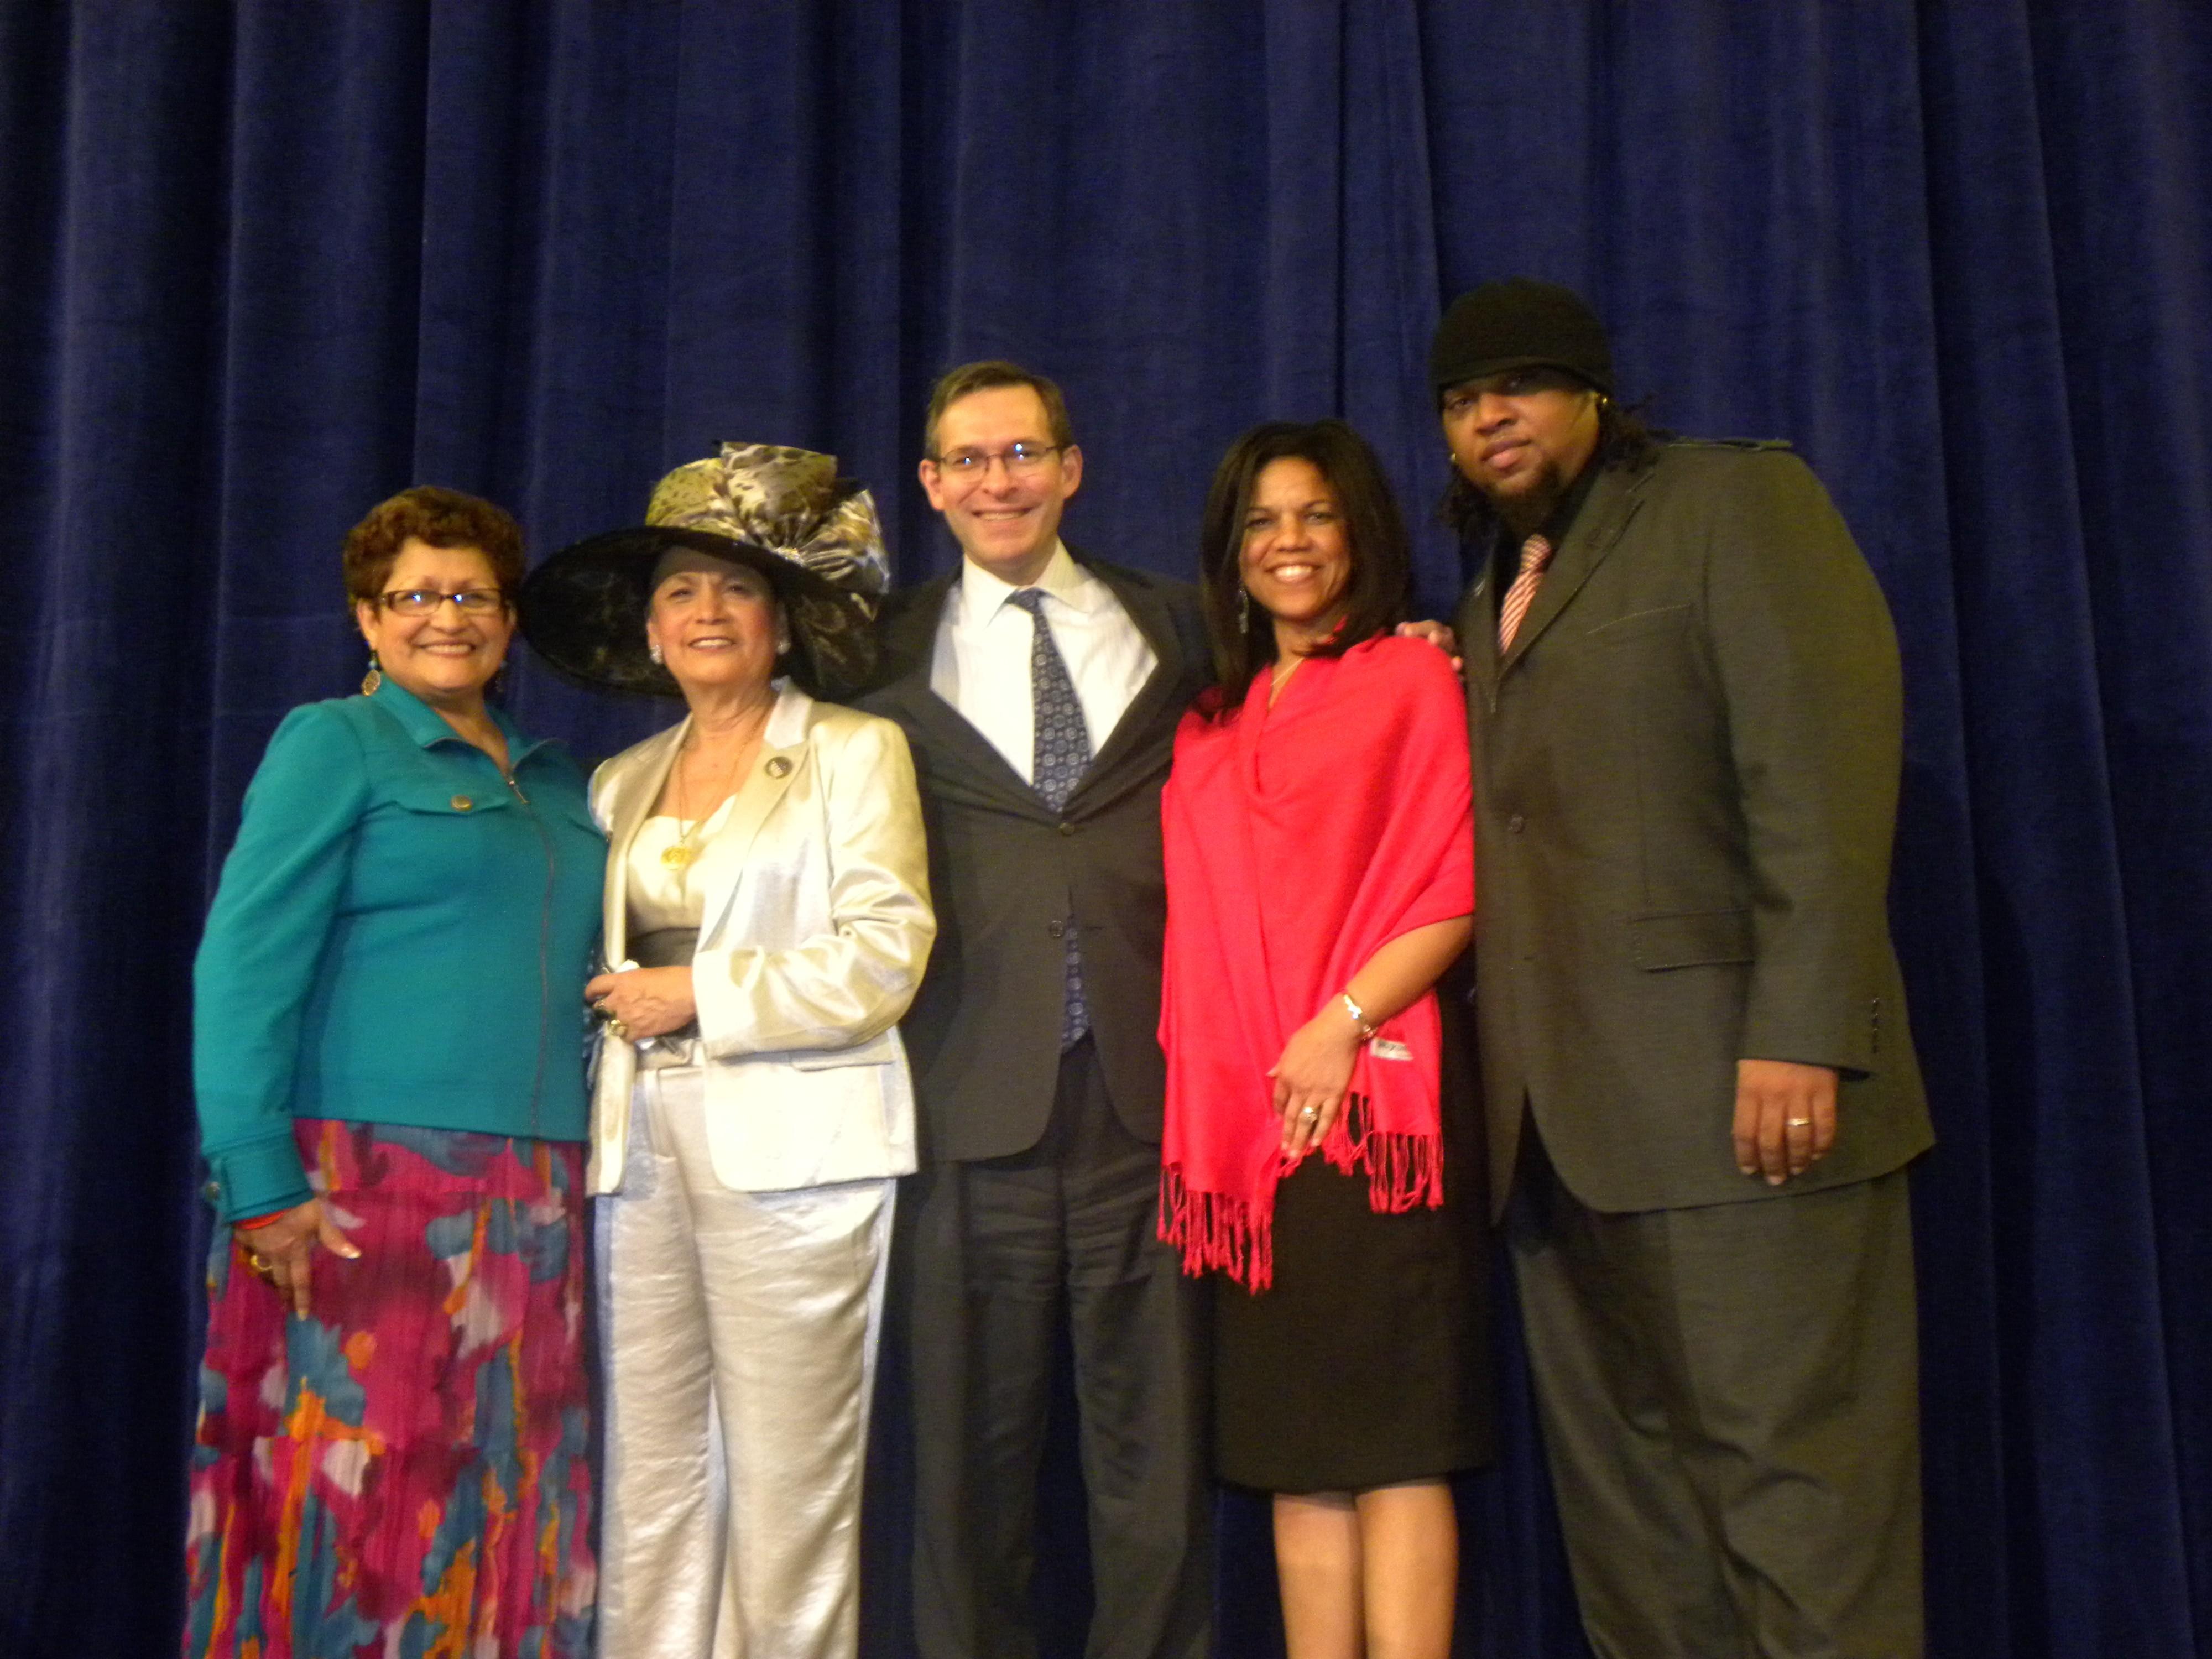 Blanca Vargas (LULAC Chicago), Rosa Rosales, Brent Wilkes (Executive Director, LULAC), Ramona Houston, Terreon Gully